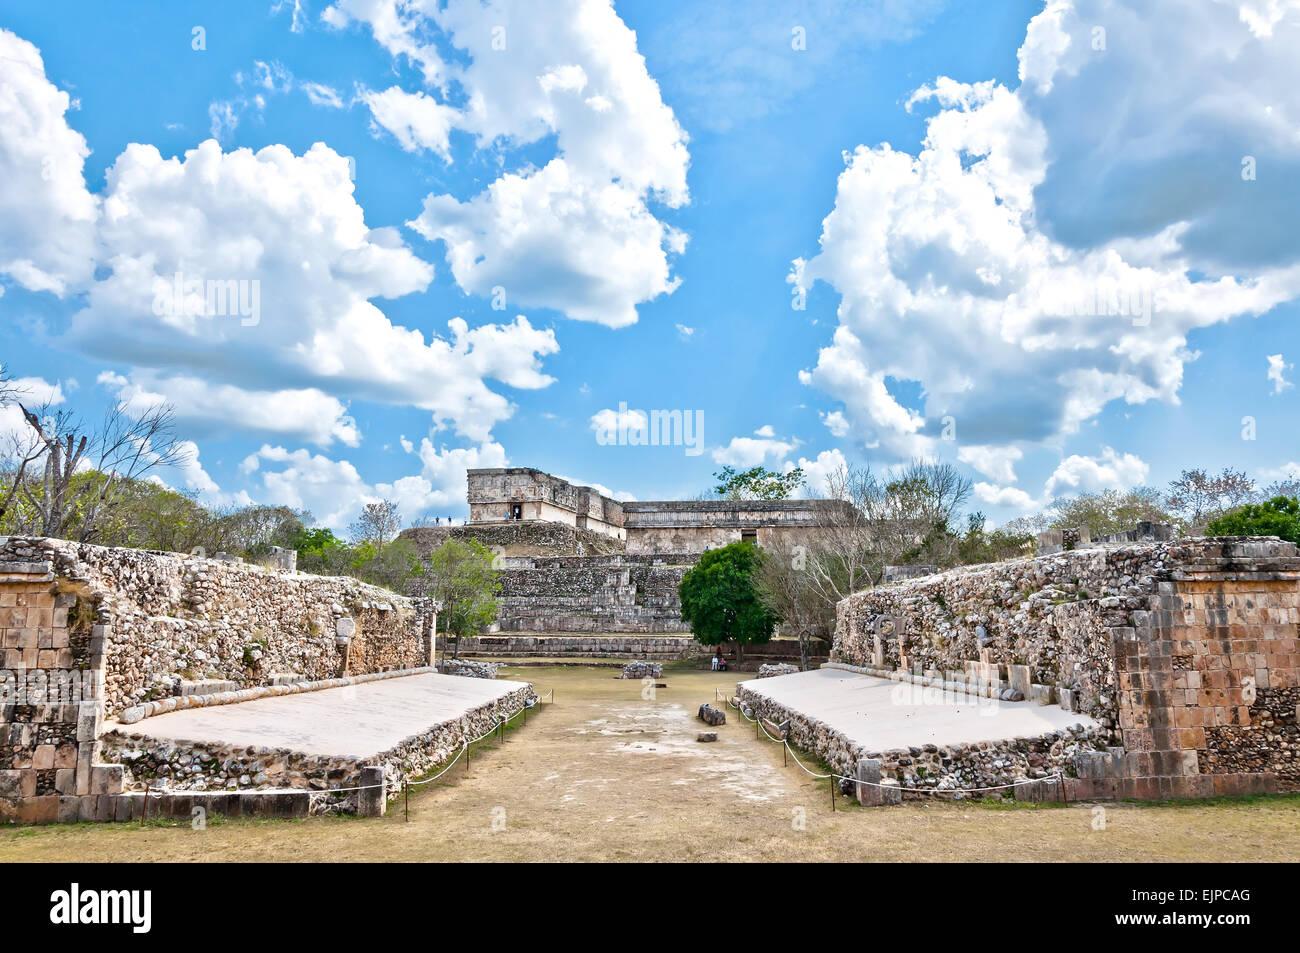 Maya ruin complex of Uxmal, Mexico - Stock Image